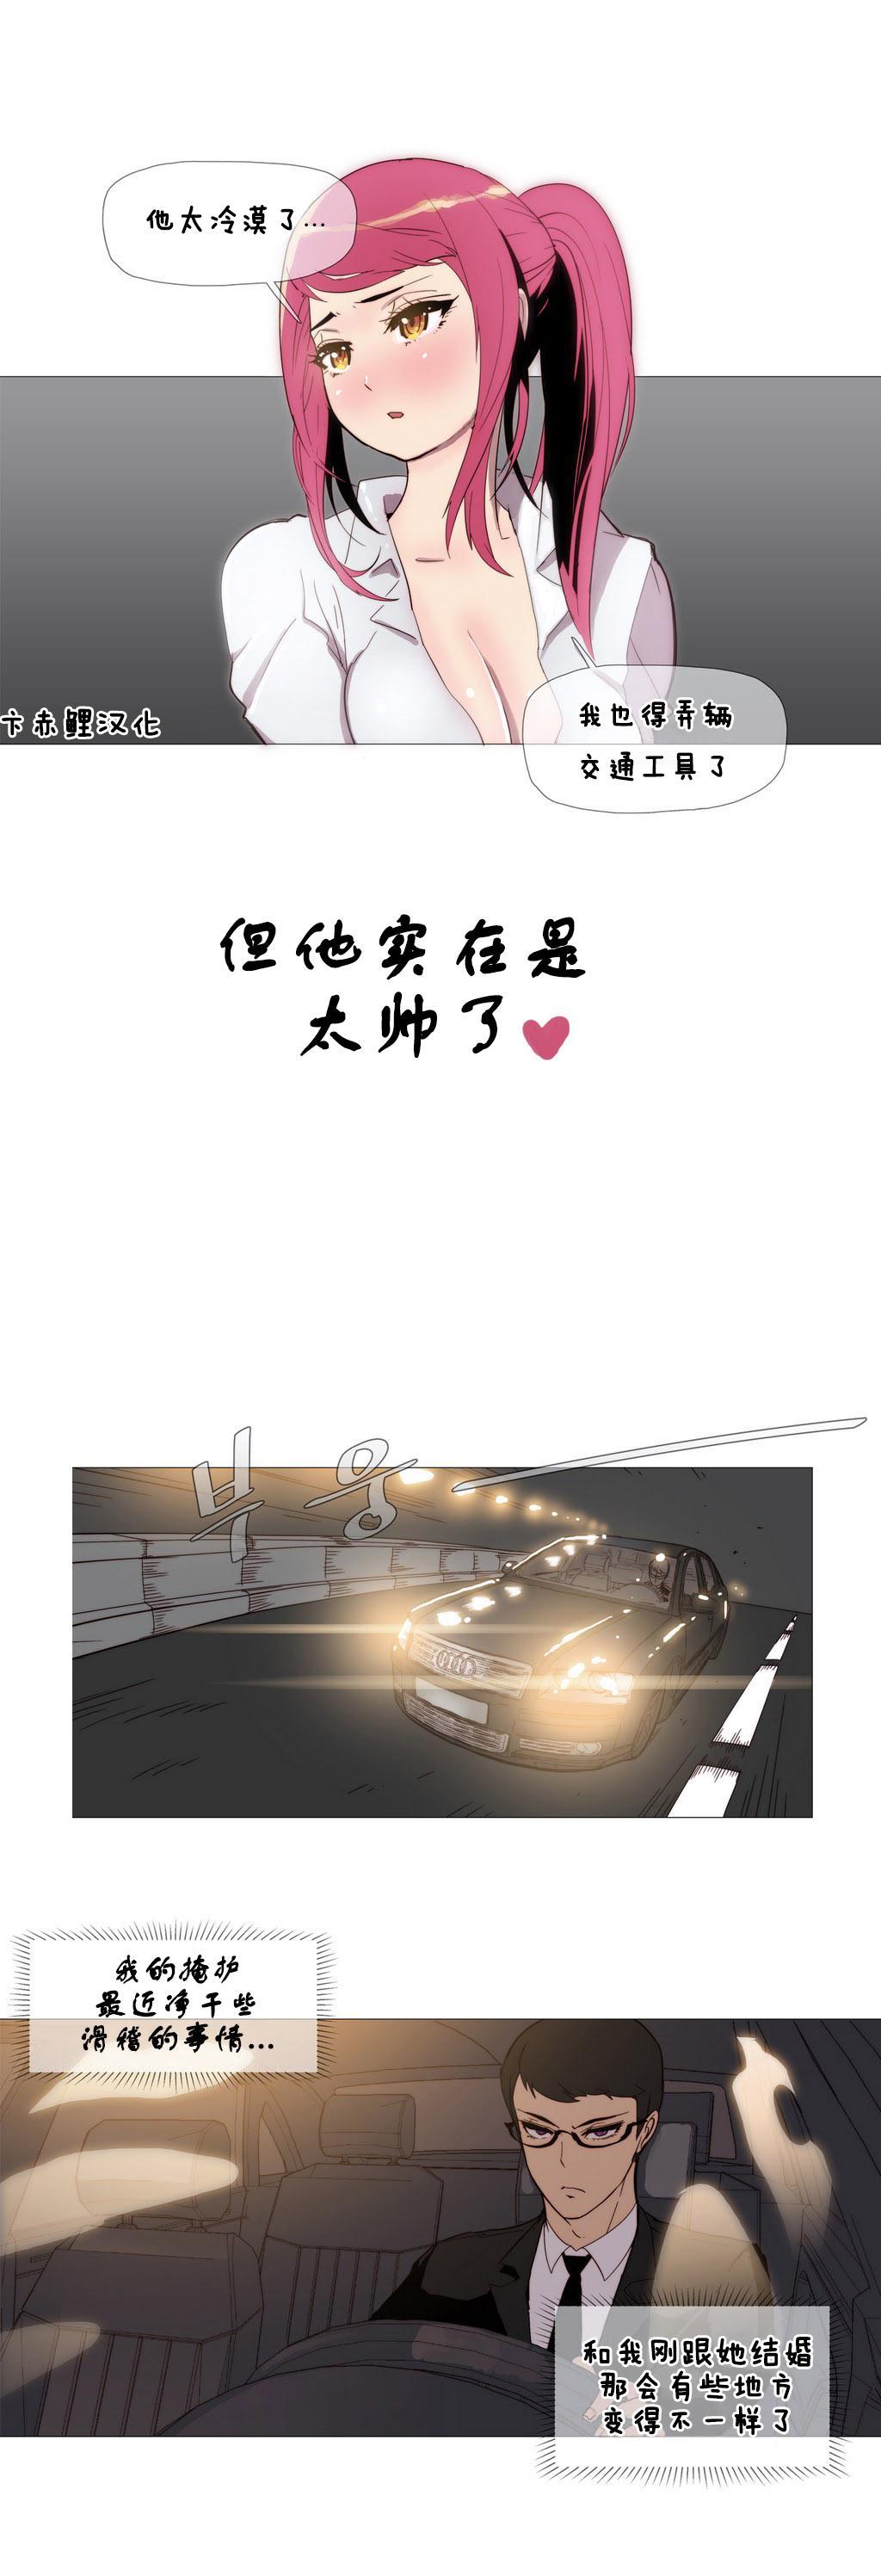 HouseHold Affairs 【卞赤鲤个人汉化】1~21话(持续更新中) 47